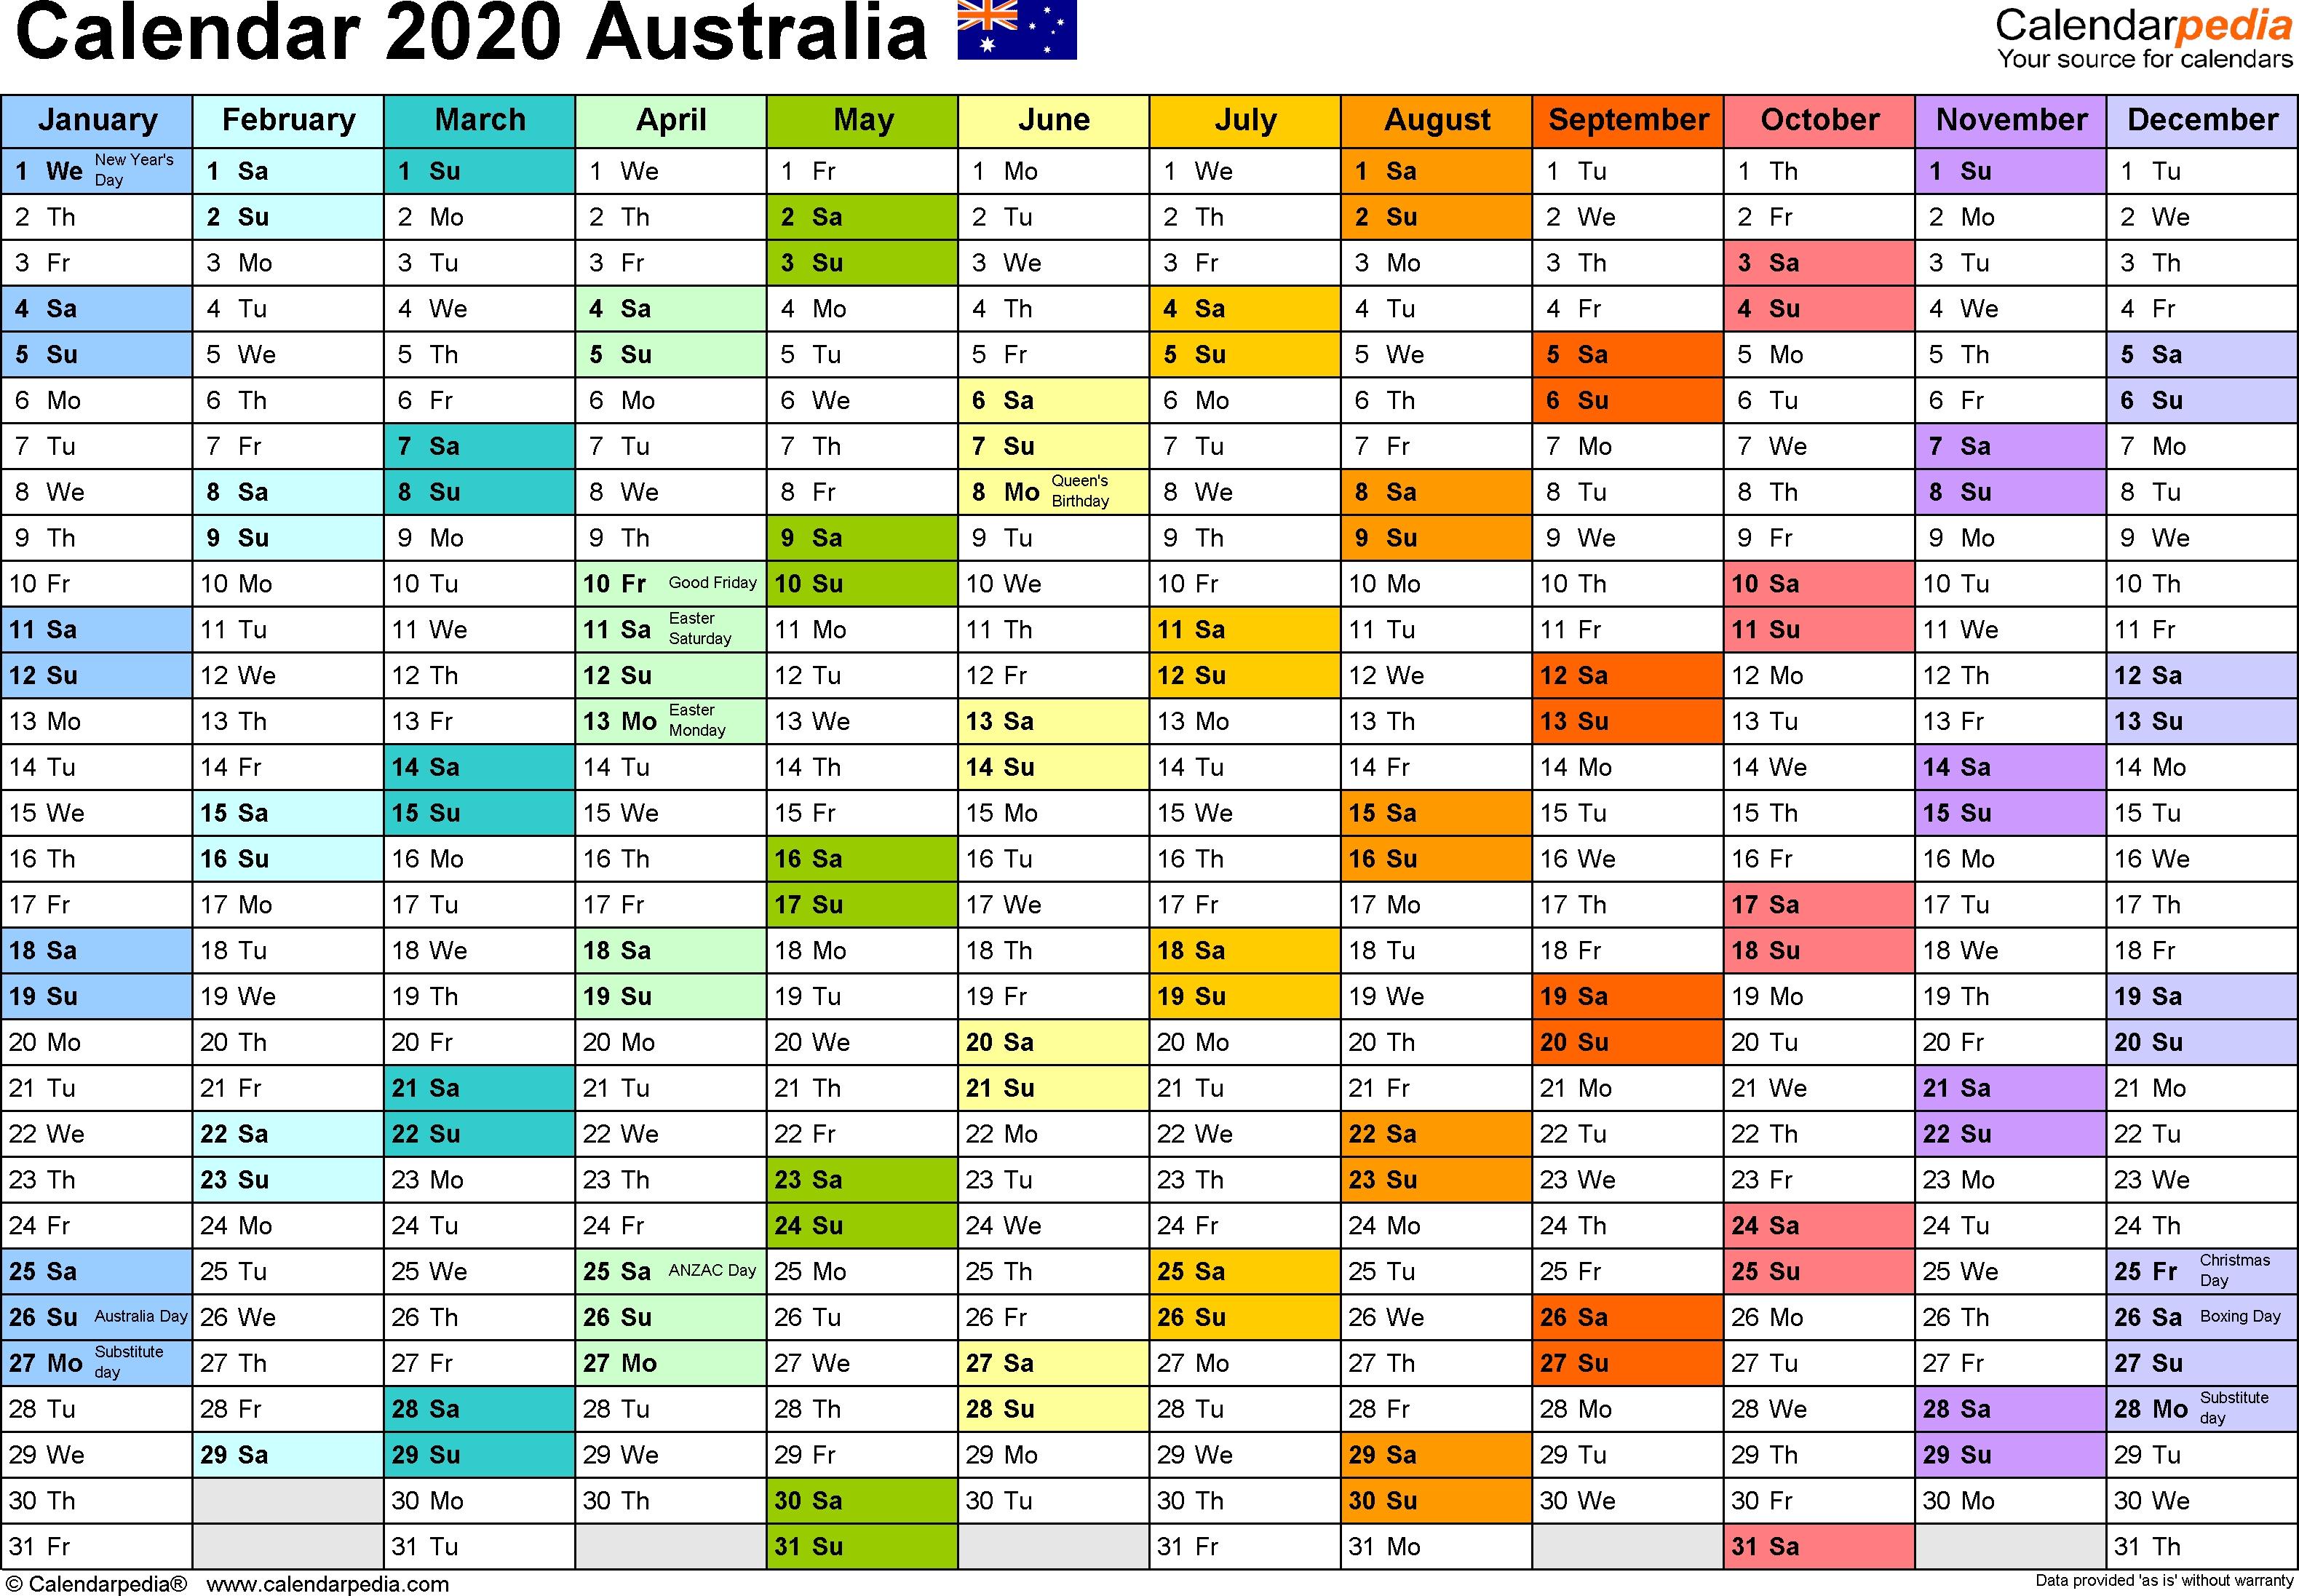 Australia Calendar 2020 - Free Printable Excel Templates  Australian Financial Year Dates 2020